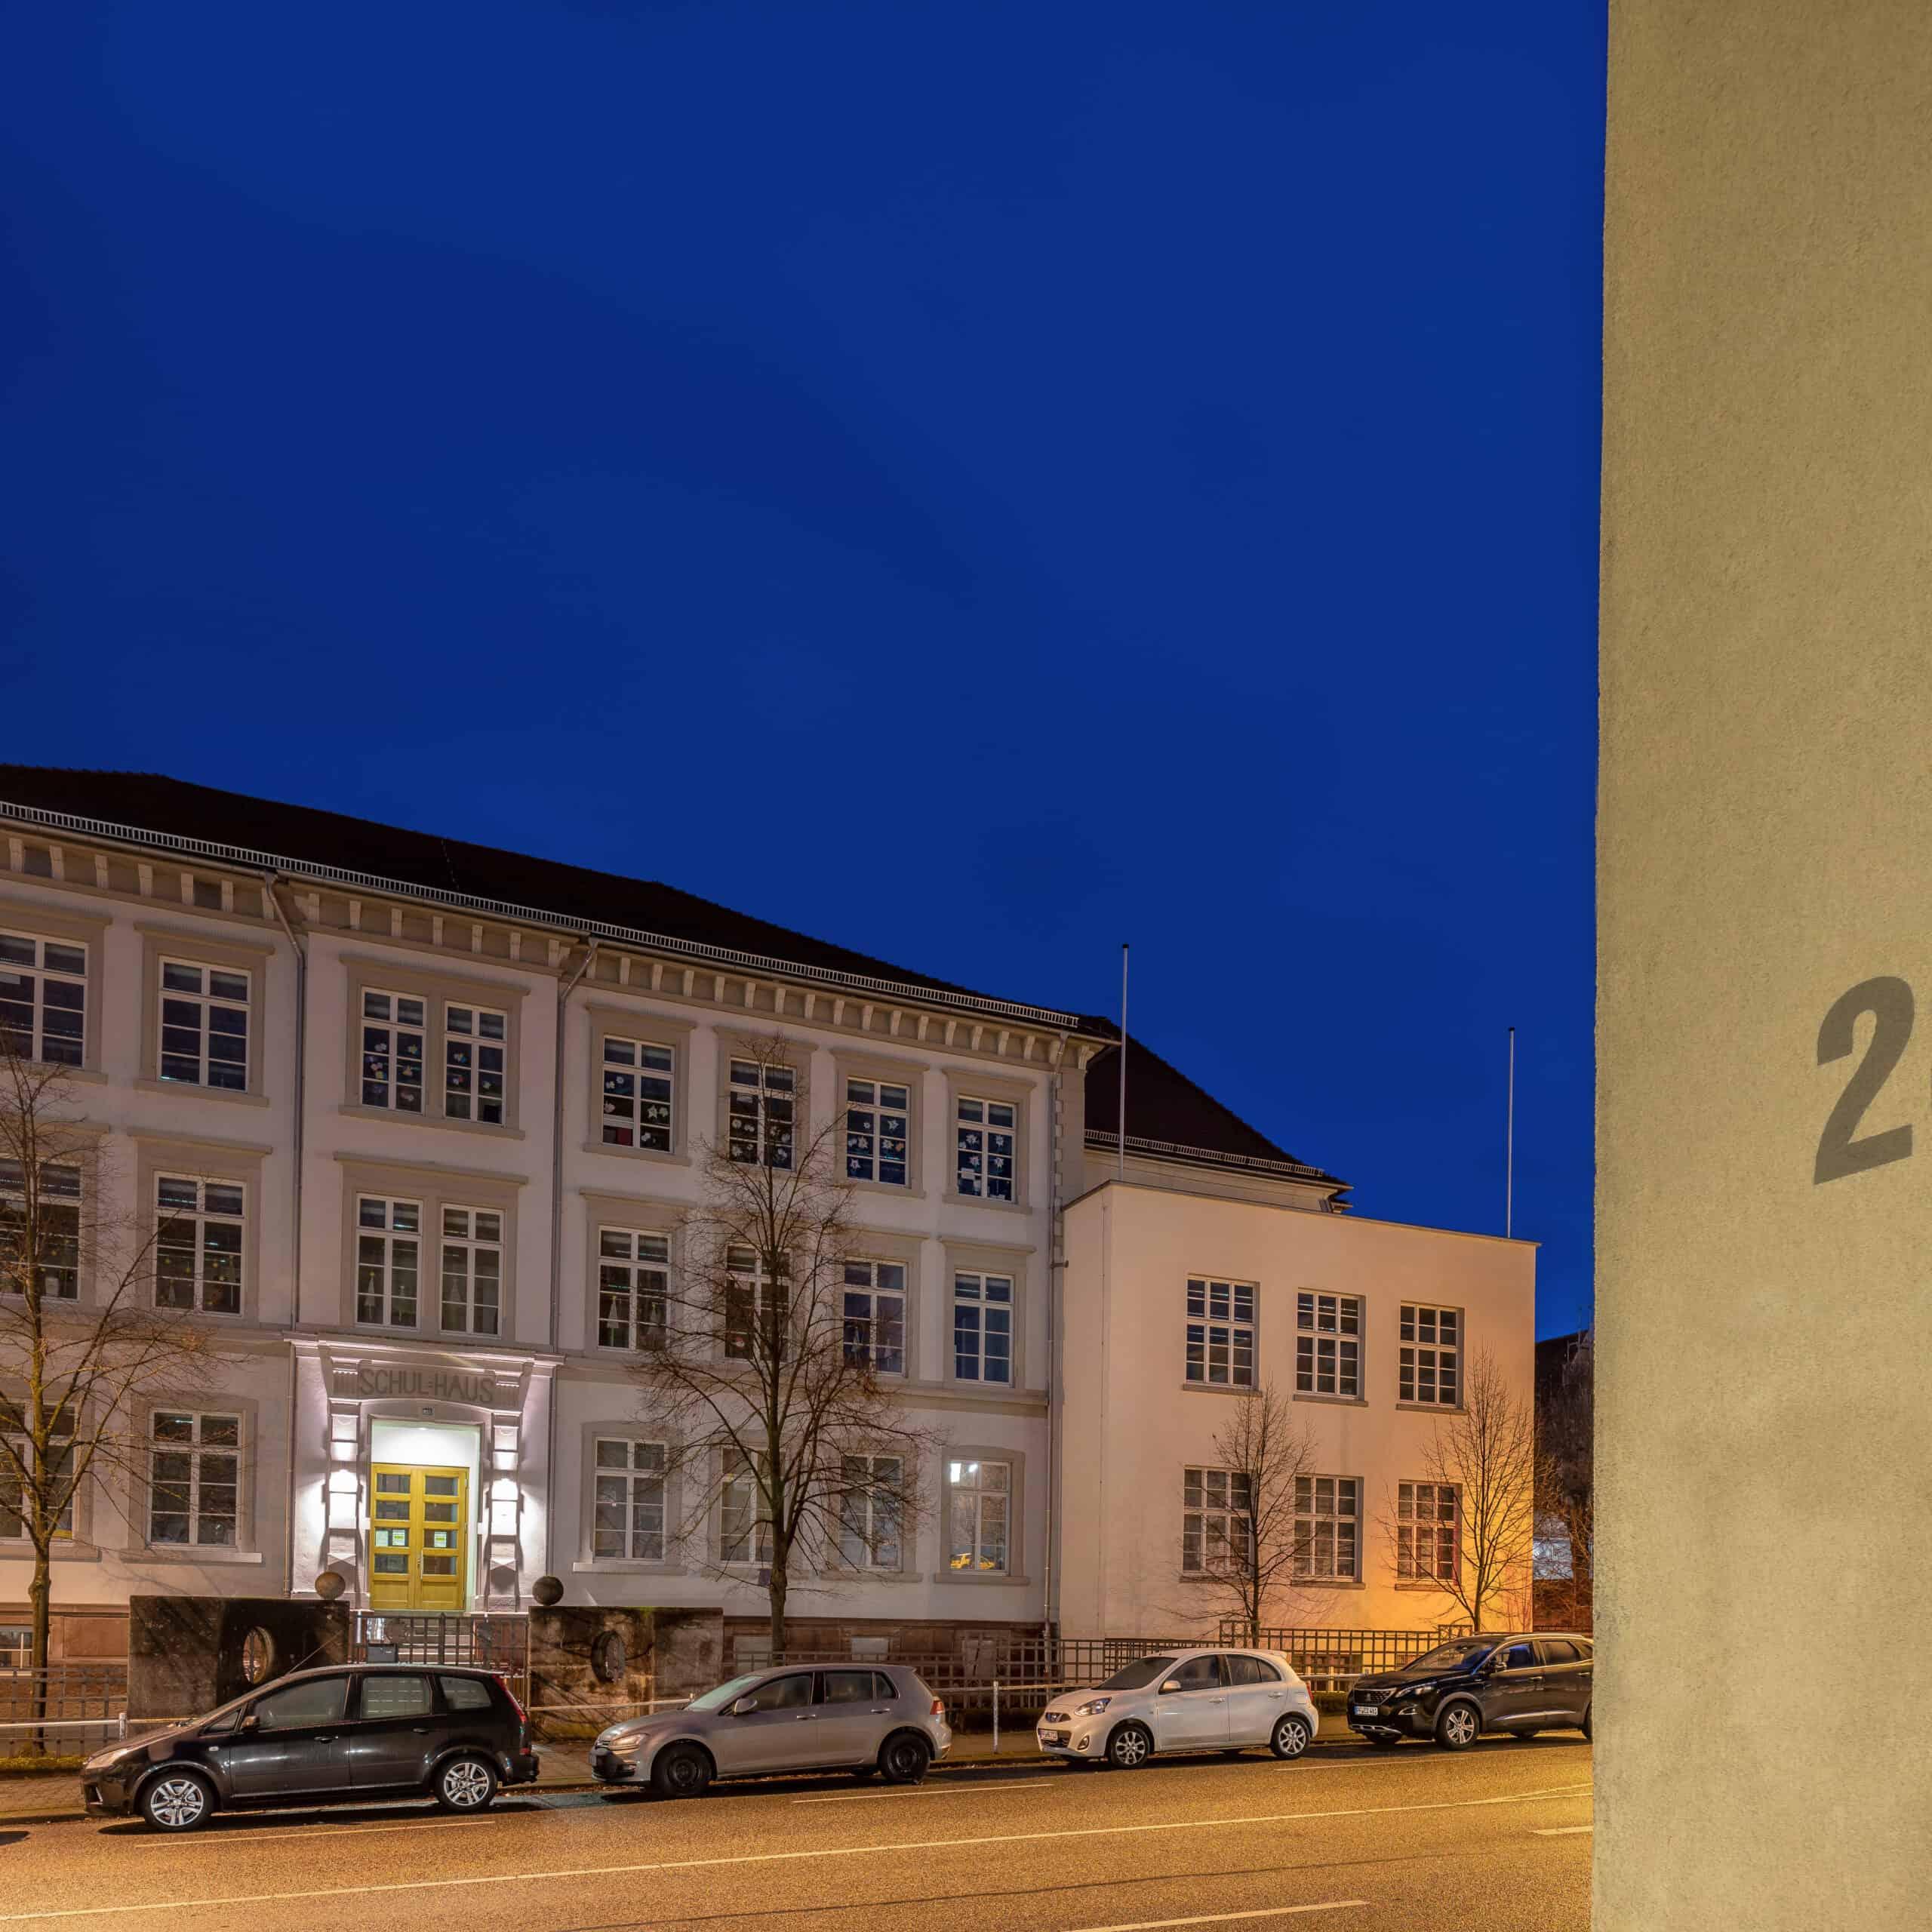 2.-BrötzingerSchuleDSC02936-scaled